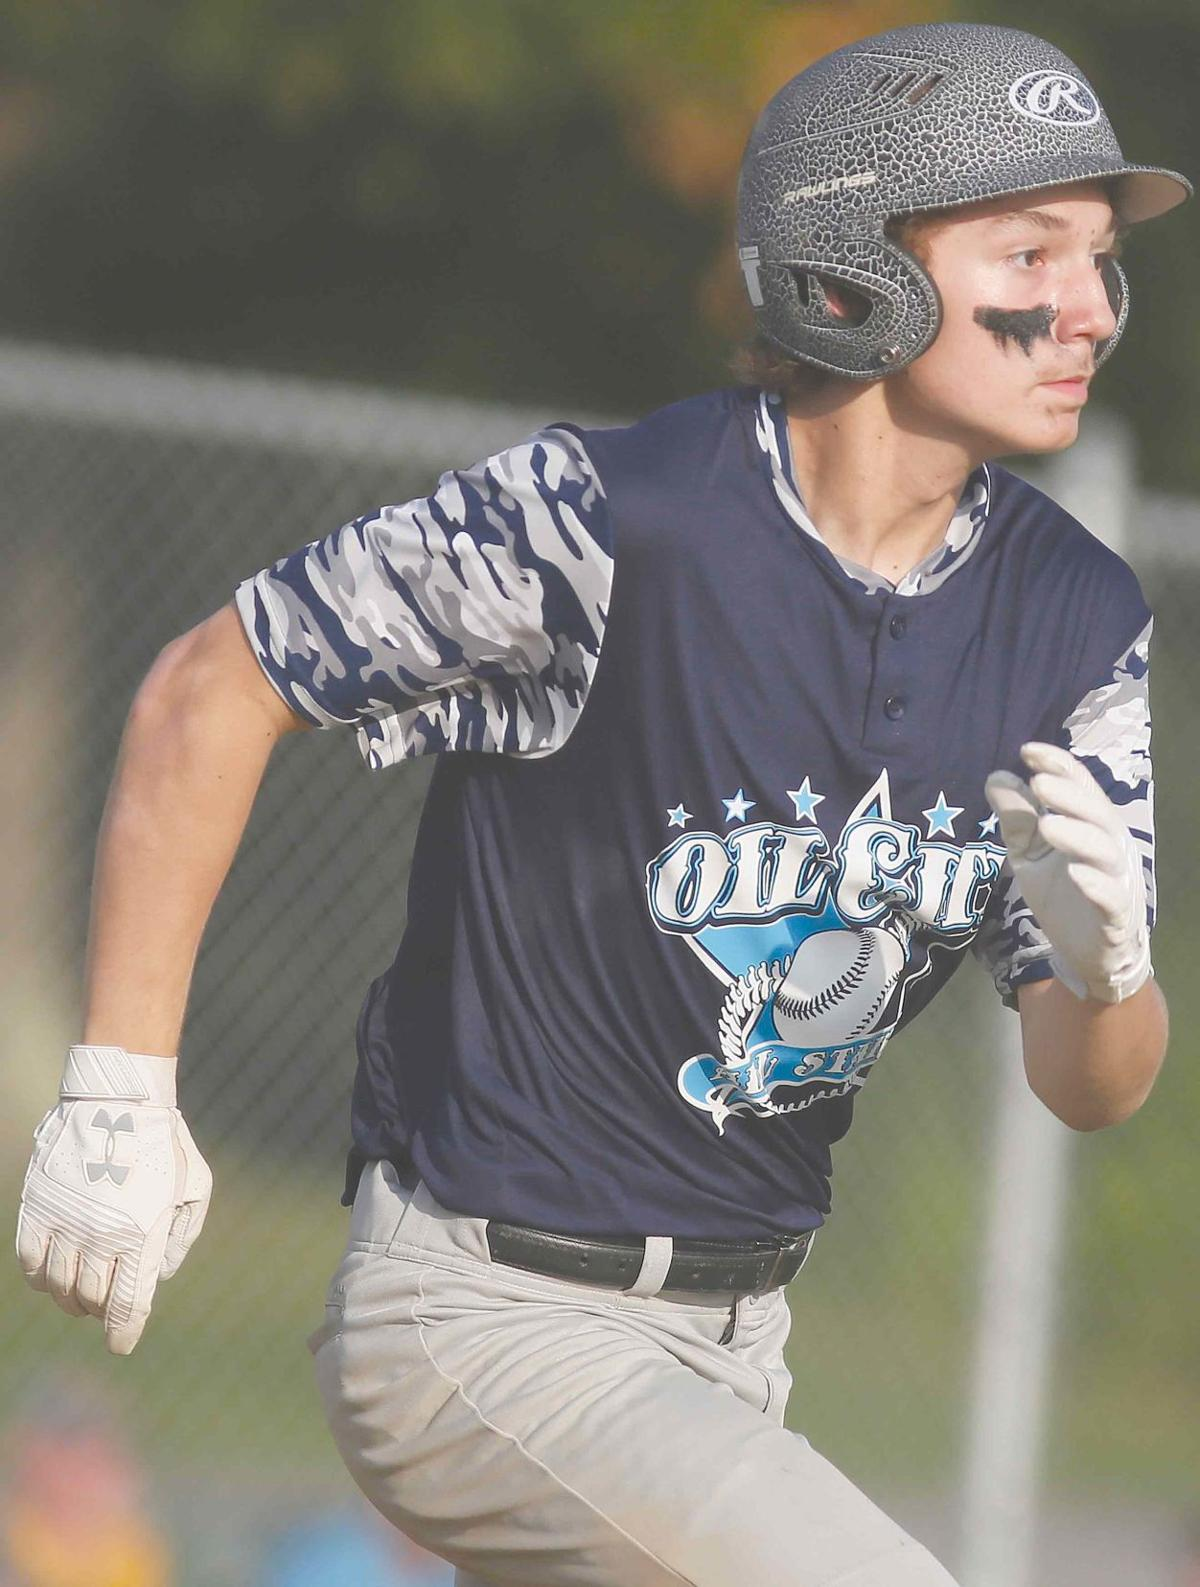 Titusville ousts OC in Junior League tilt